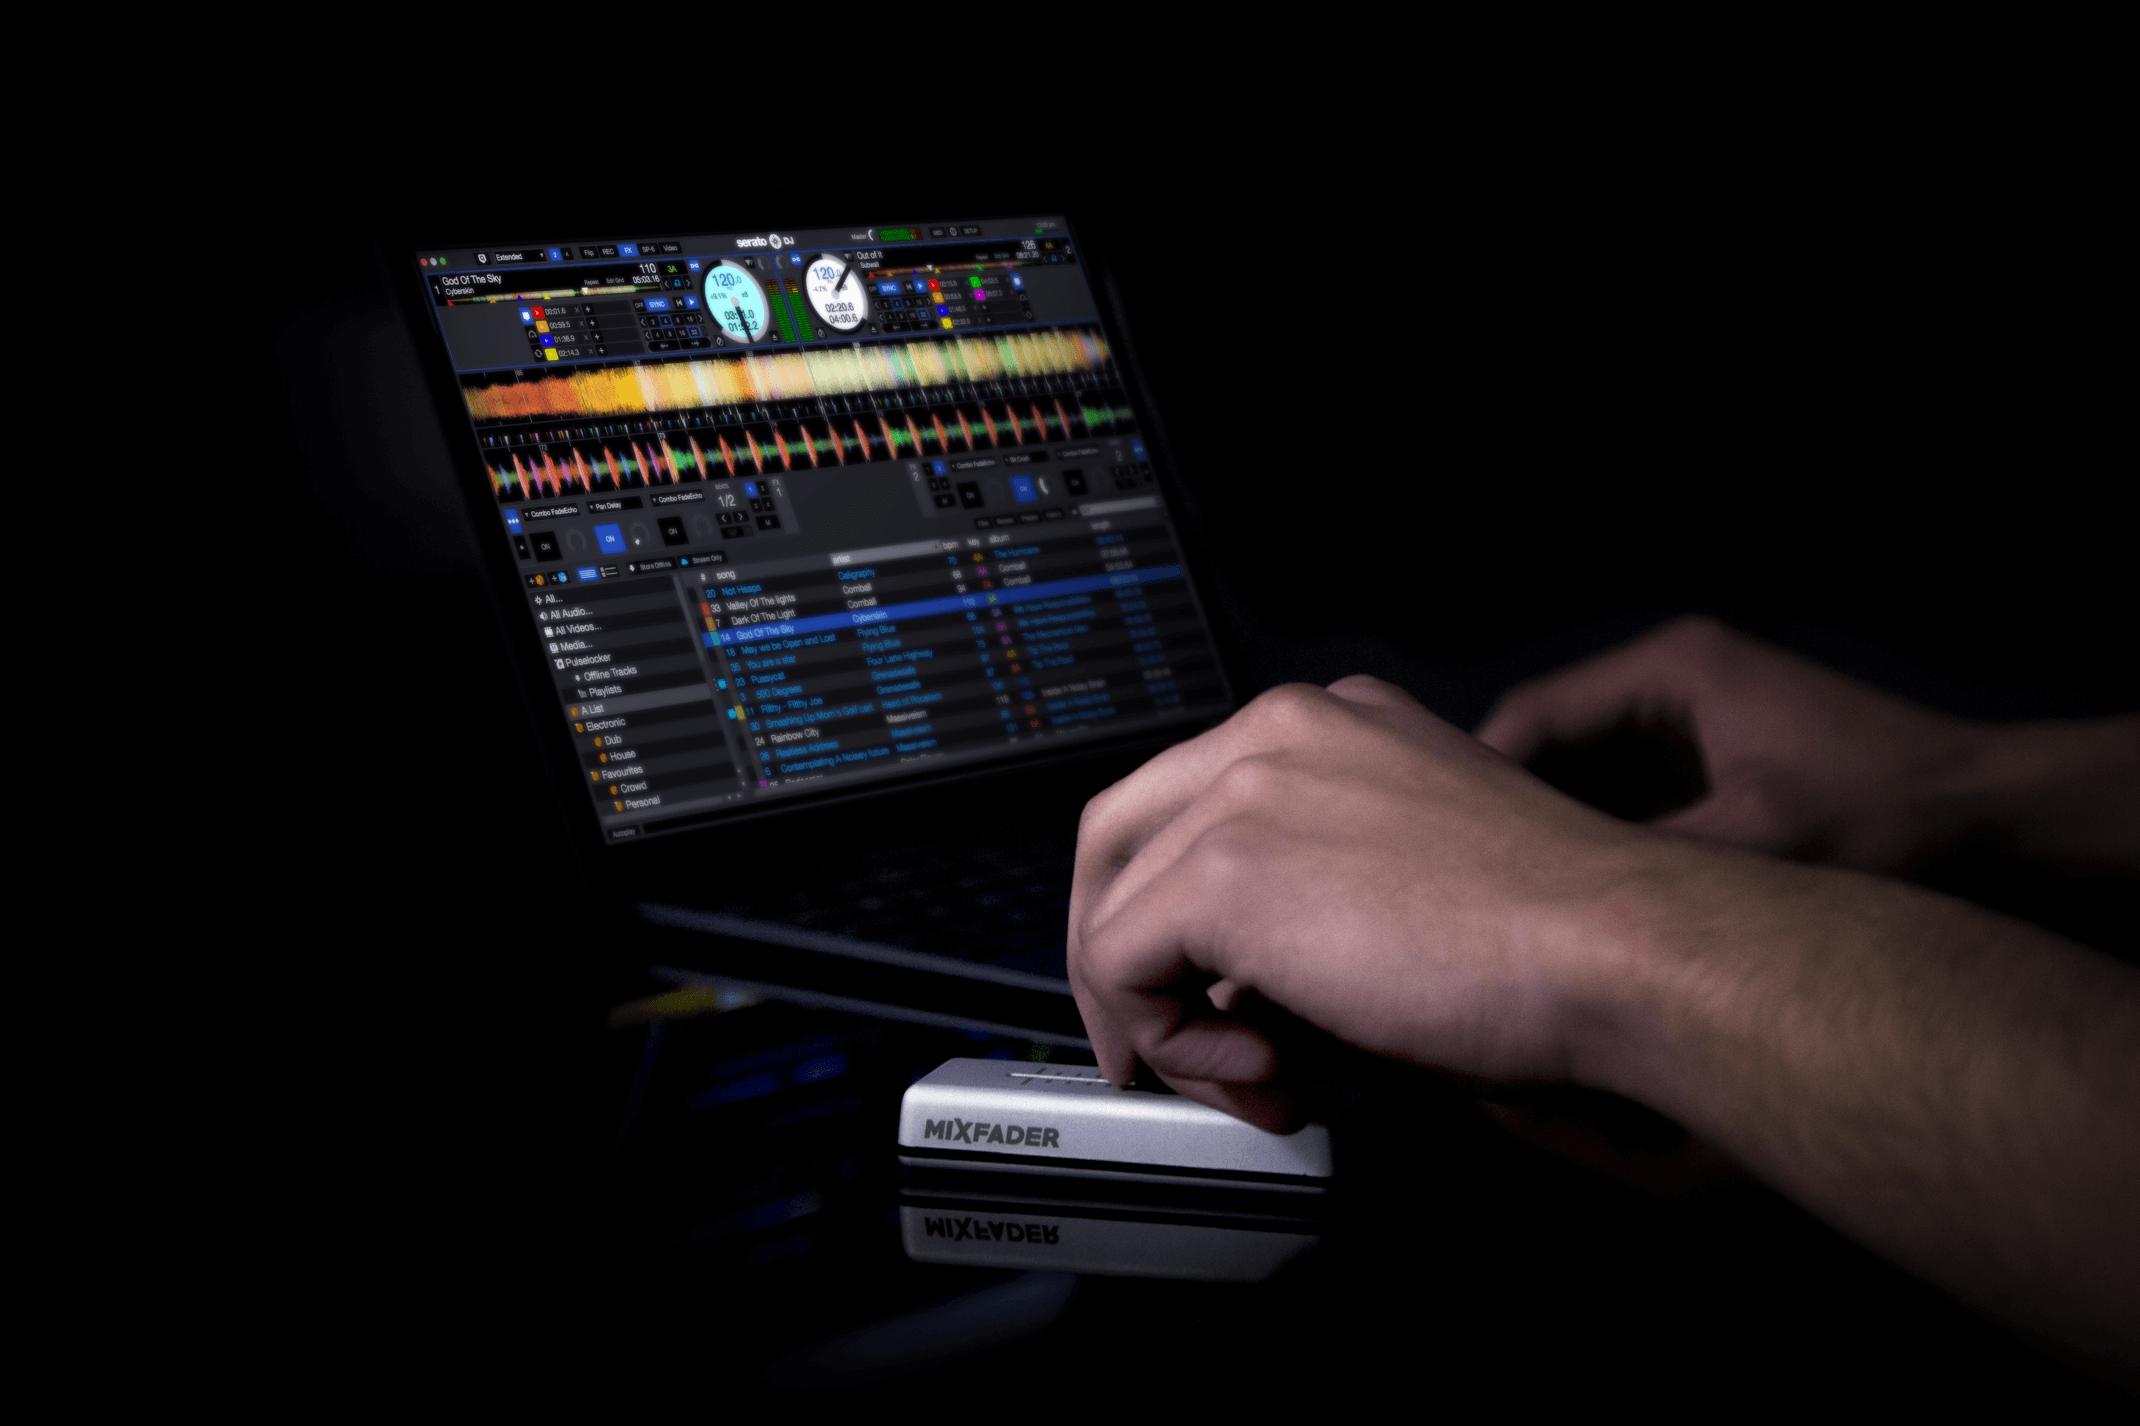 Mixfader and MIDI